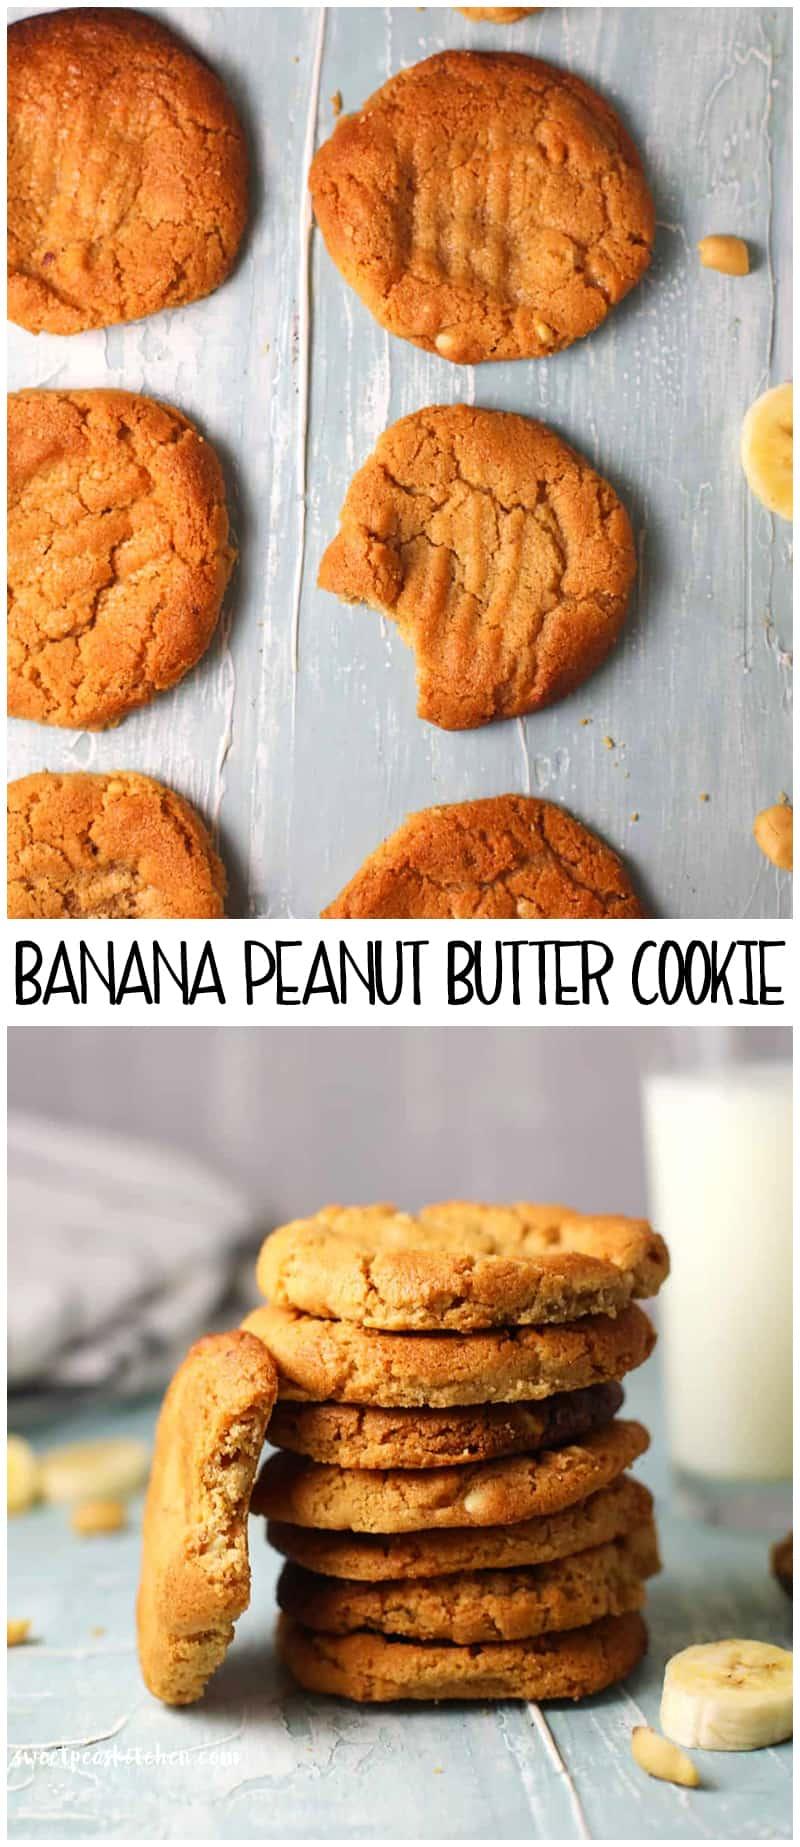 Banana Peanut Butter Cookie Recipe